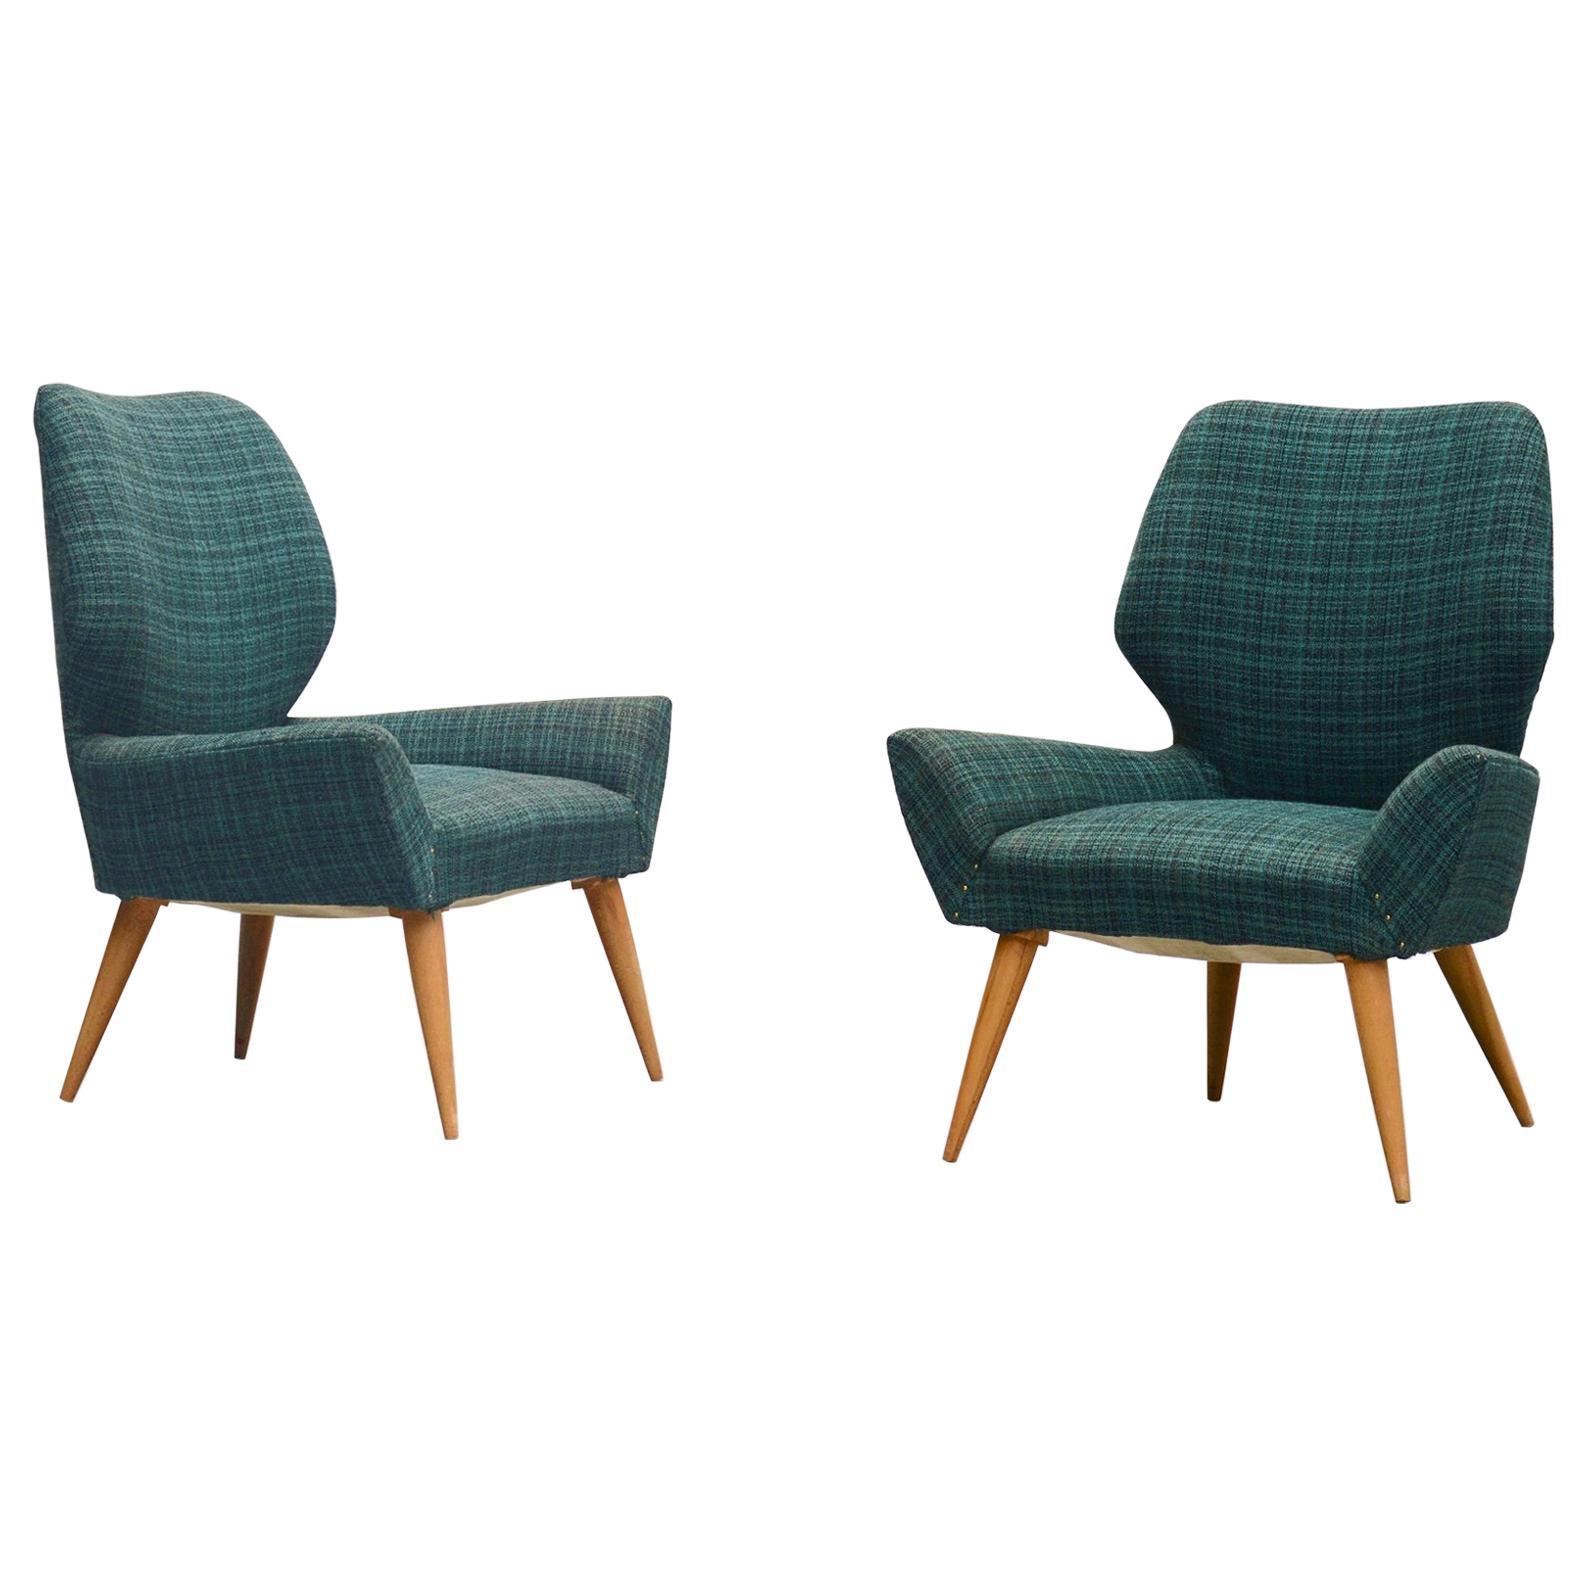 Isa Bergamo Club Chairs in Original Fabric, Italy, 1950